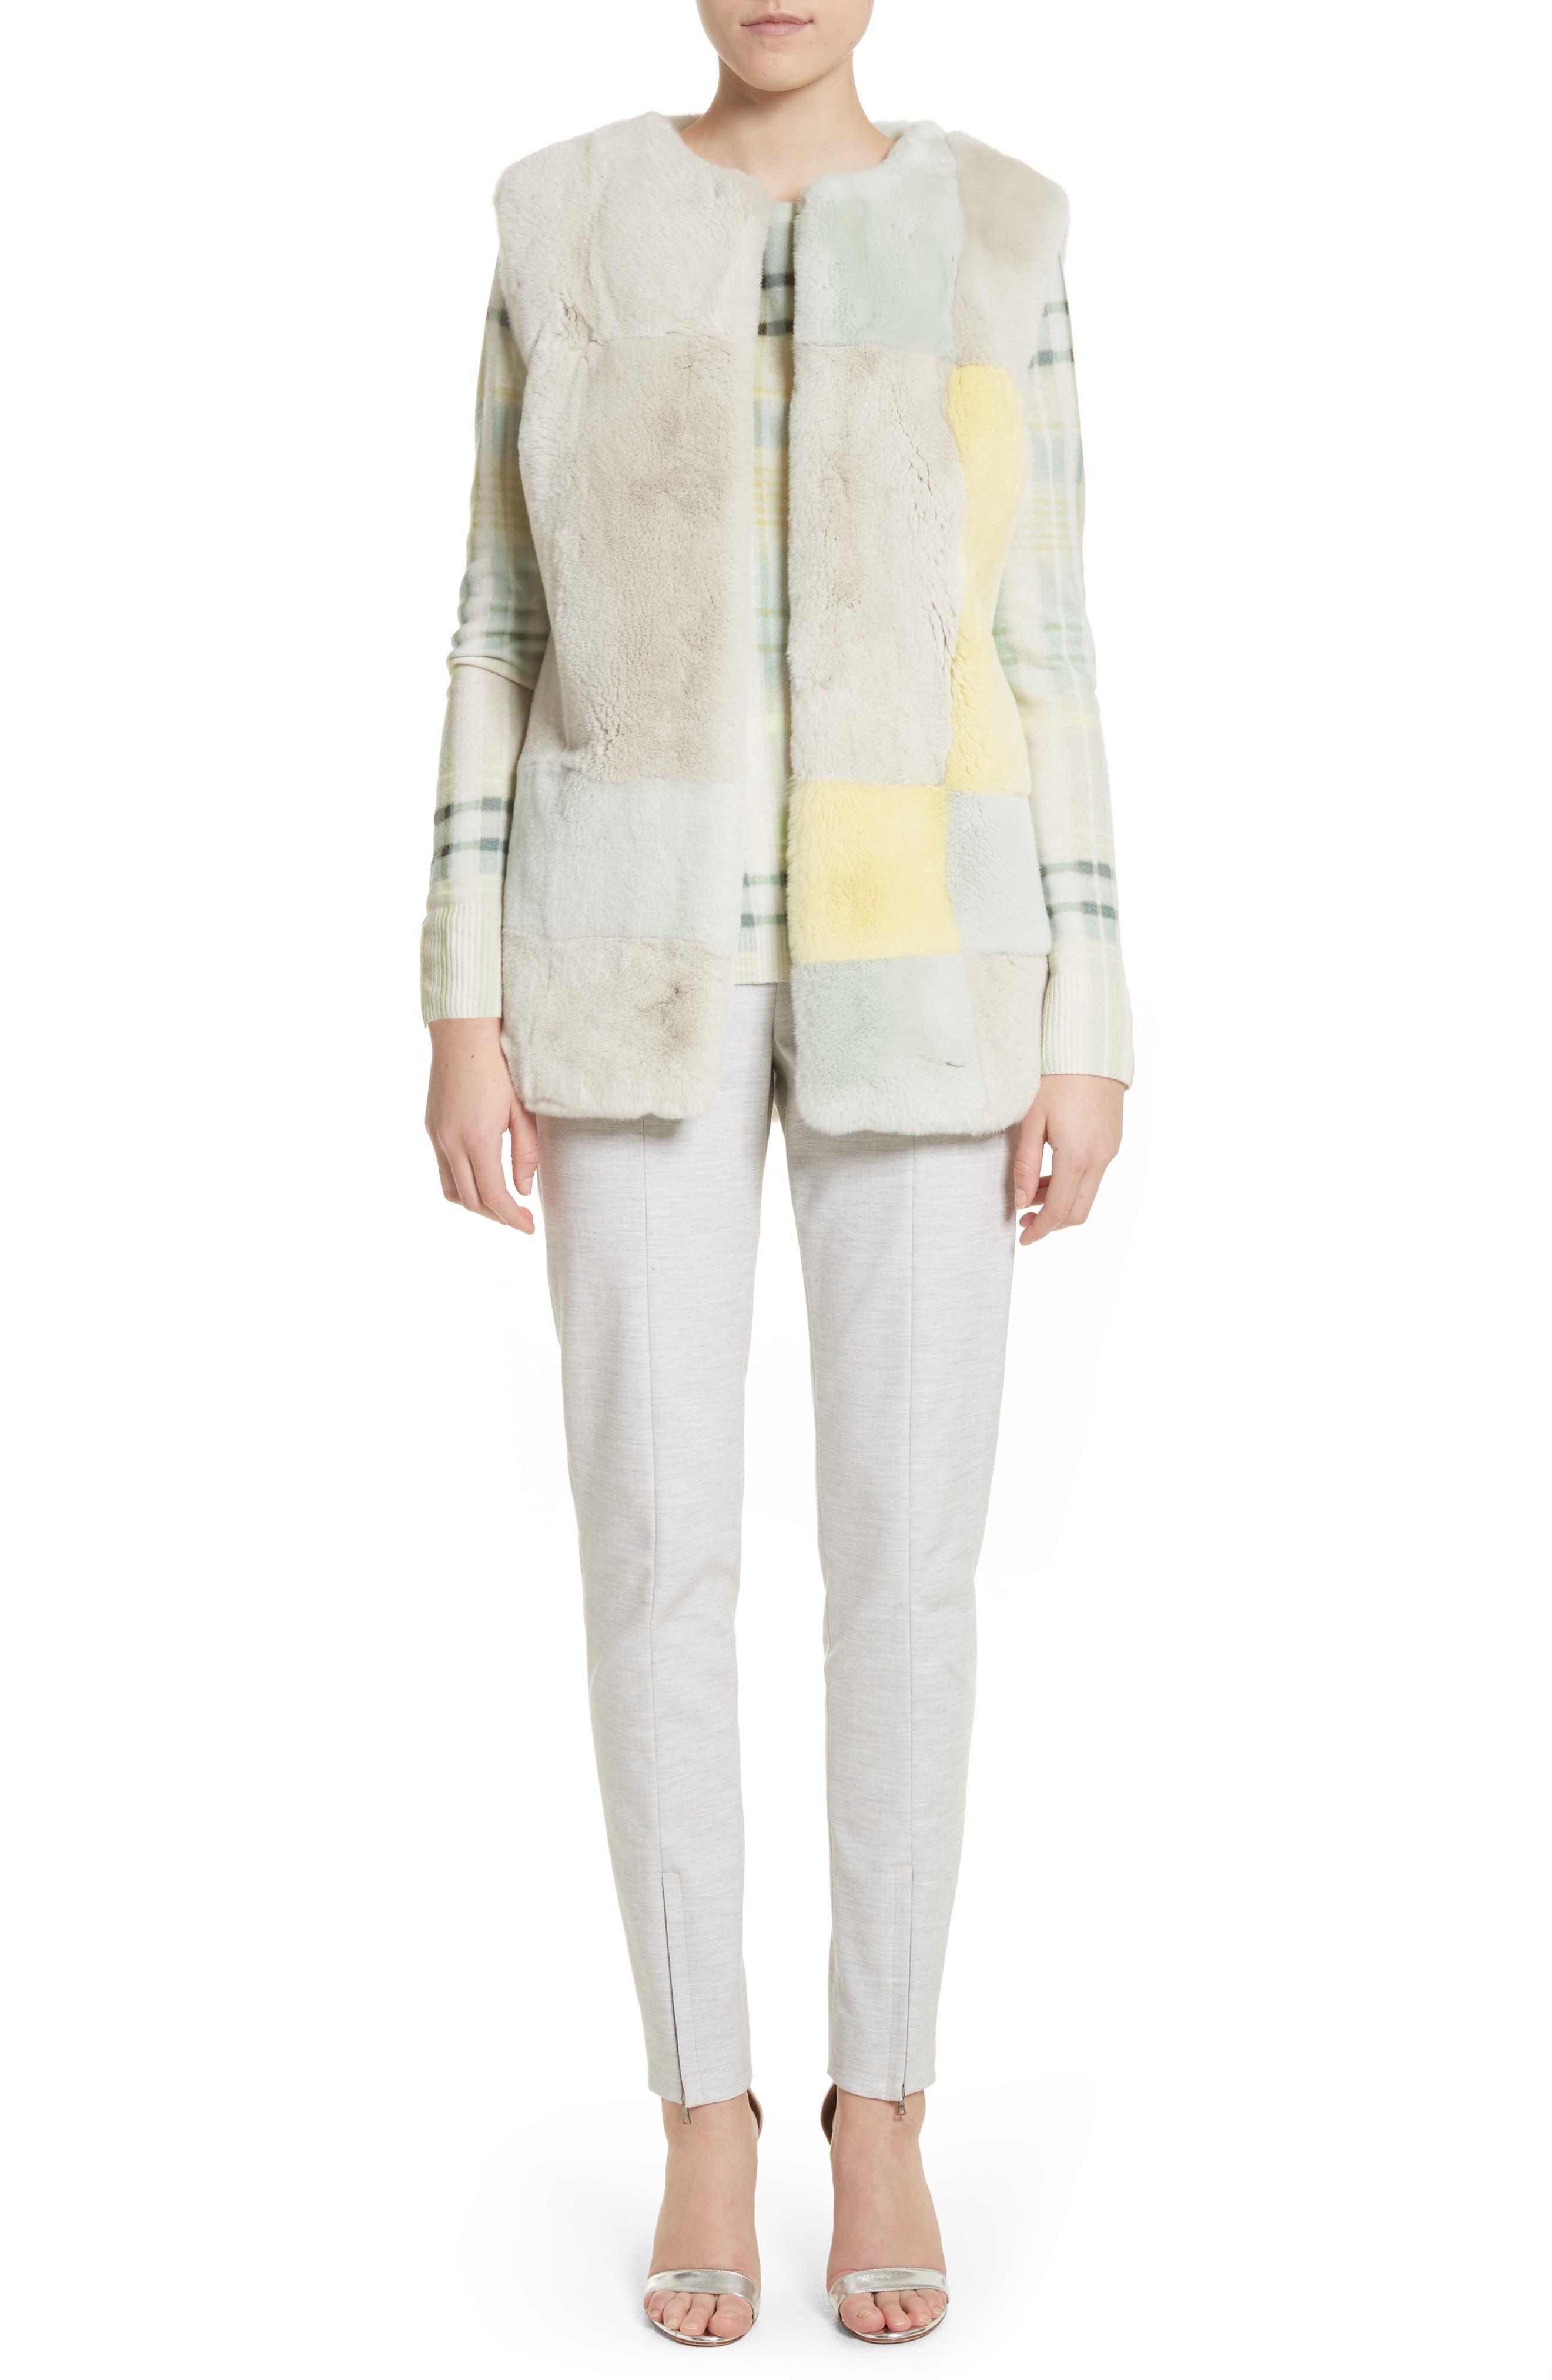 Summer Bella Double Weave Pants,                             Alternate thumbnail 6, color,                             Light Grey Melange